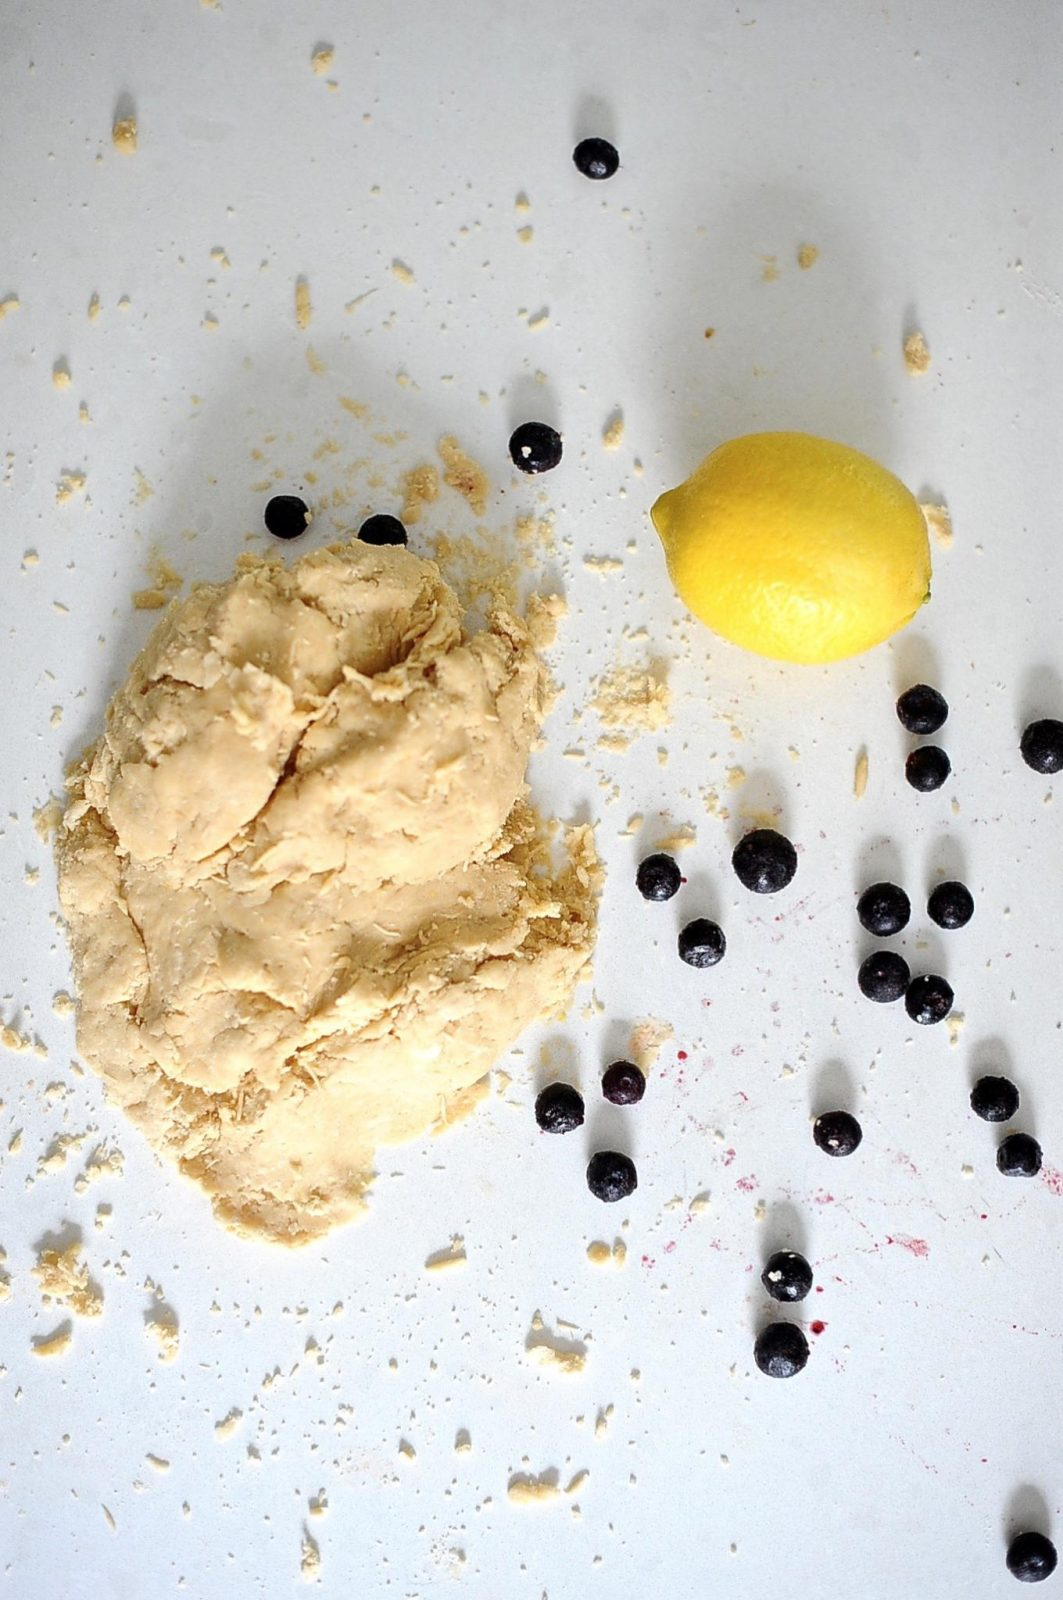 Vegan heart shaped blueberry pop-tarts, dough and lemon.